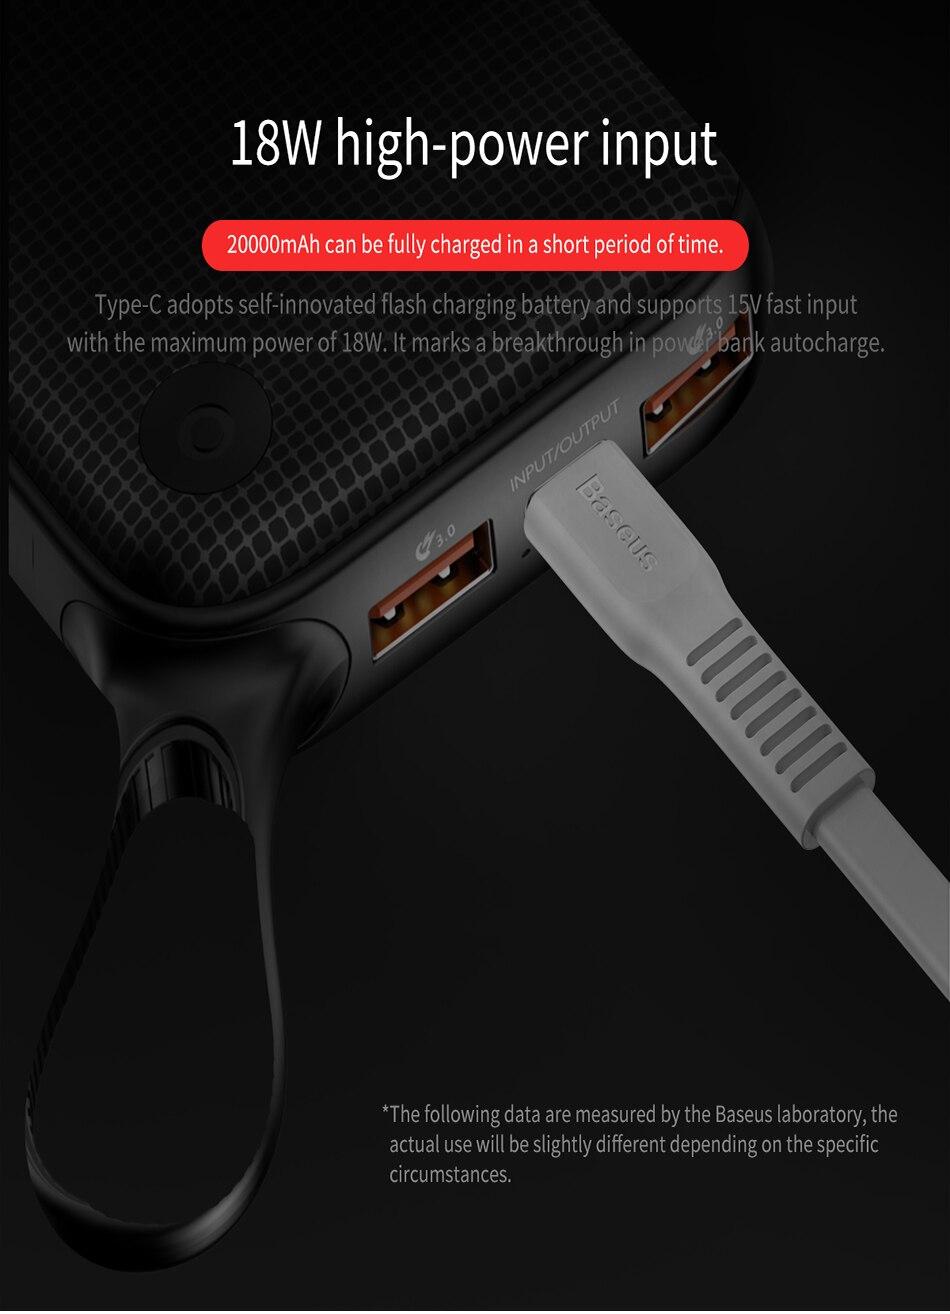 Baseus 20000mAh Quick Charge 3.0 Power Bank For Xiaomi Mi 000 mAh USB C PD Fast Portable External Battery Charger Powerbank 13